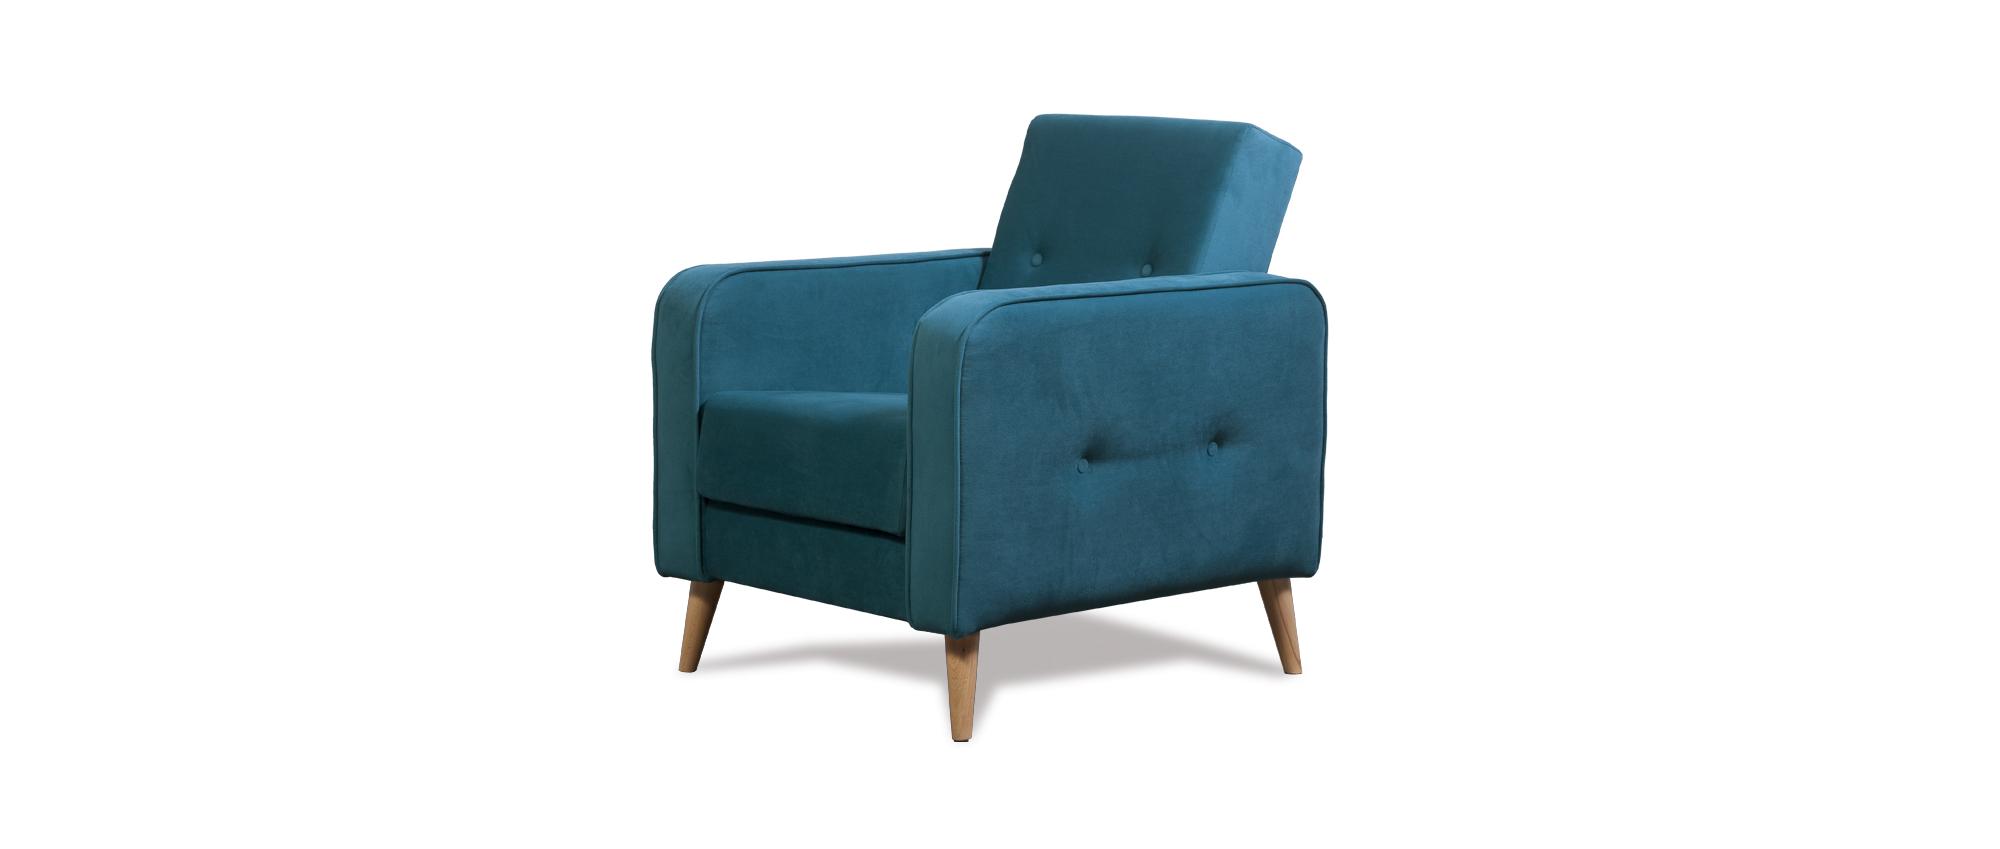 Fotelja Kongo